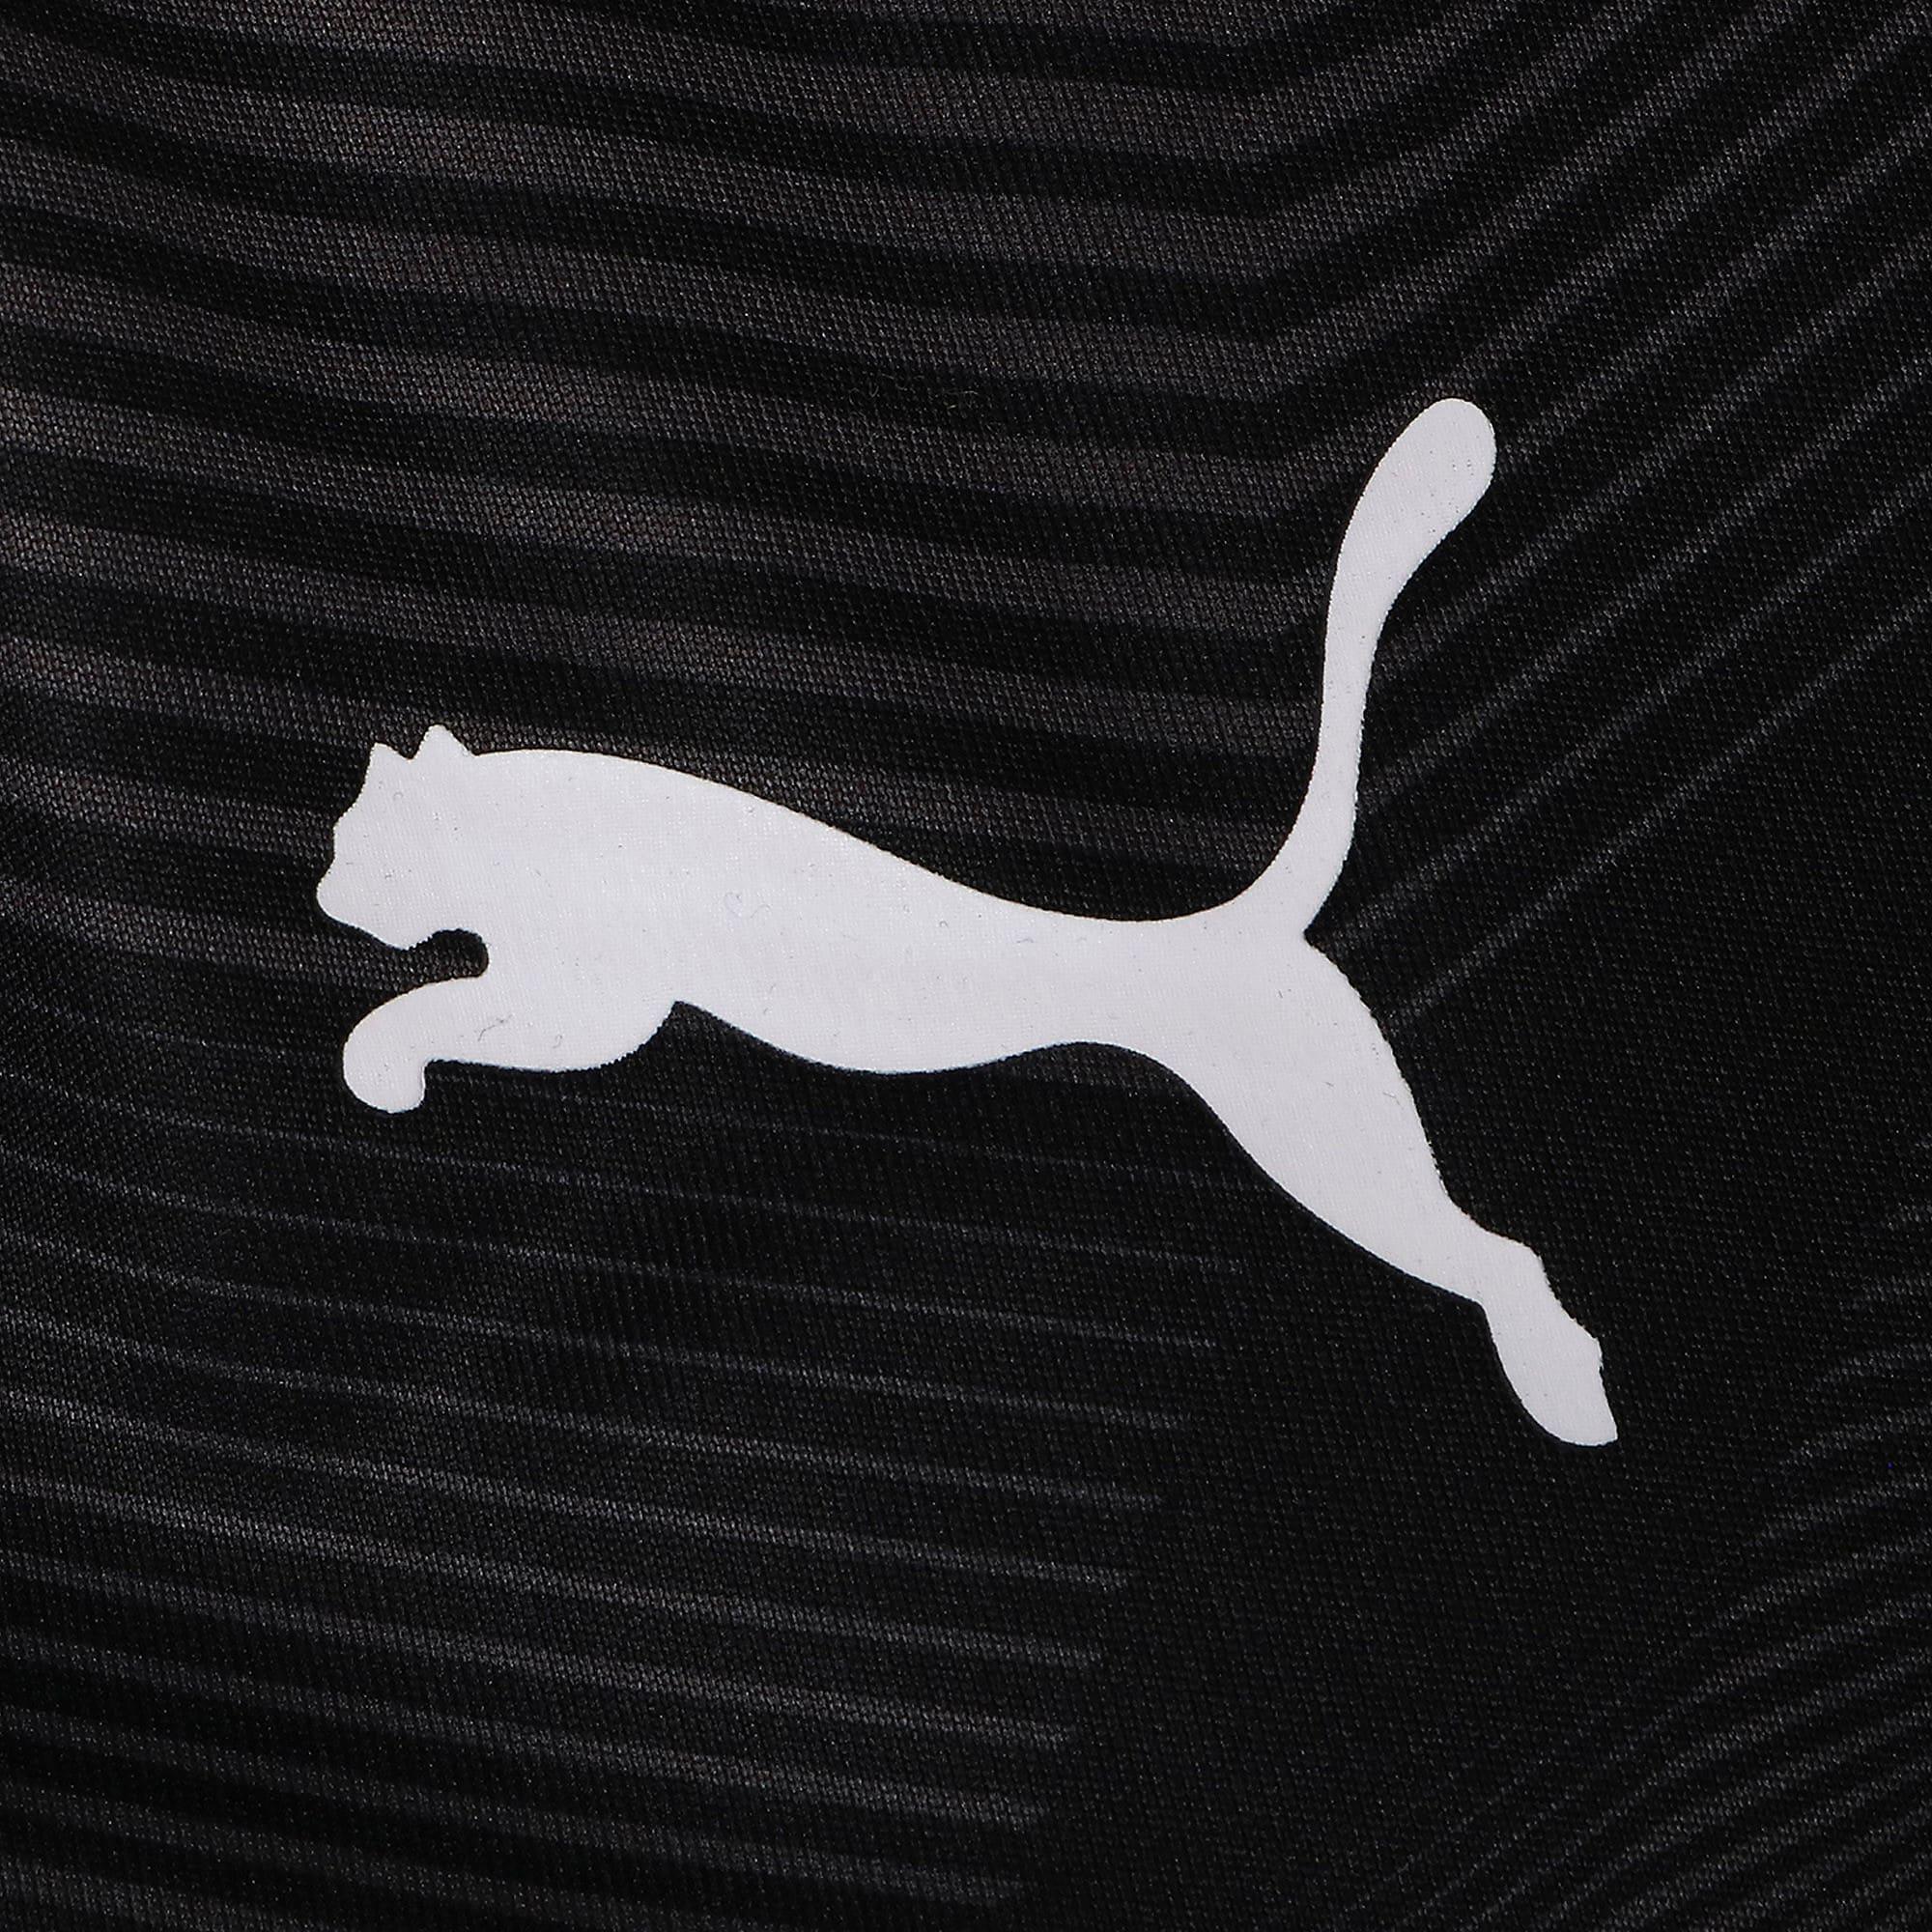 Thumbnail 4 of AC MILAN グラフィック ジャージー, Puma Black-Dark Shadow, medium-JPN